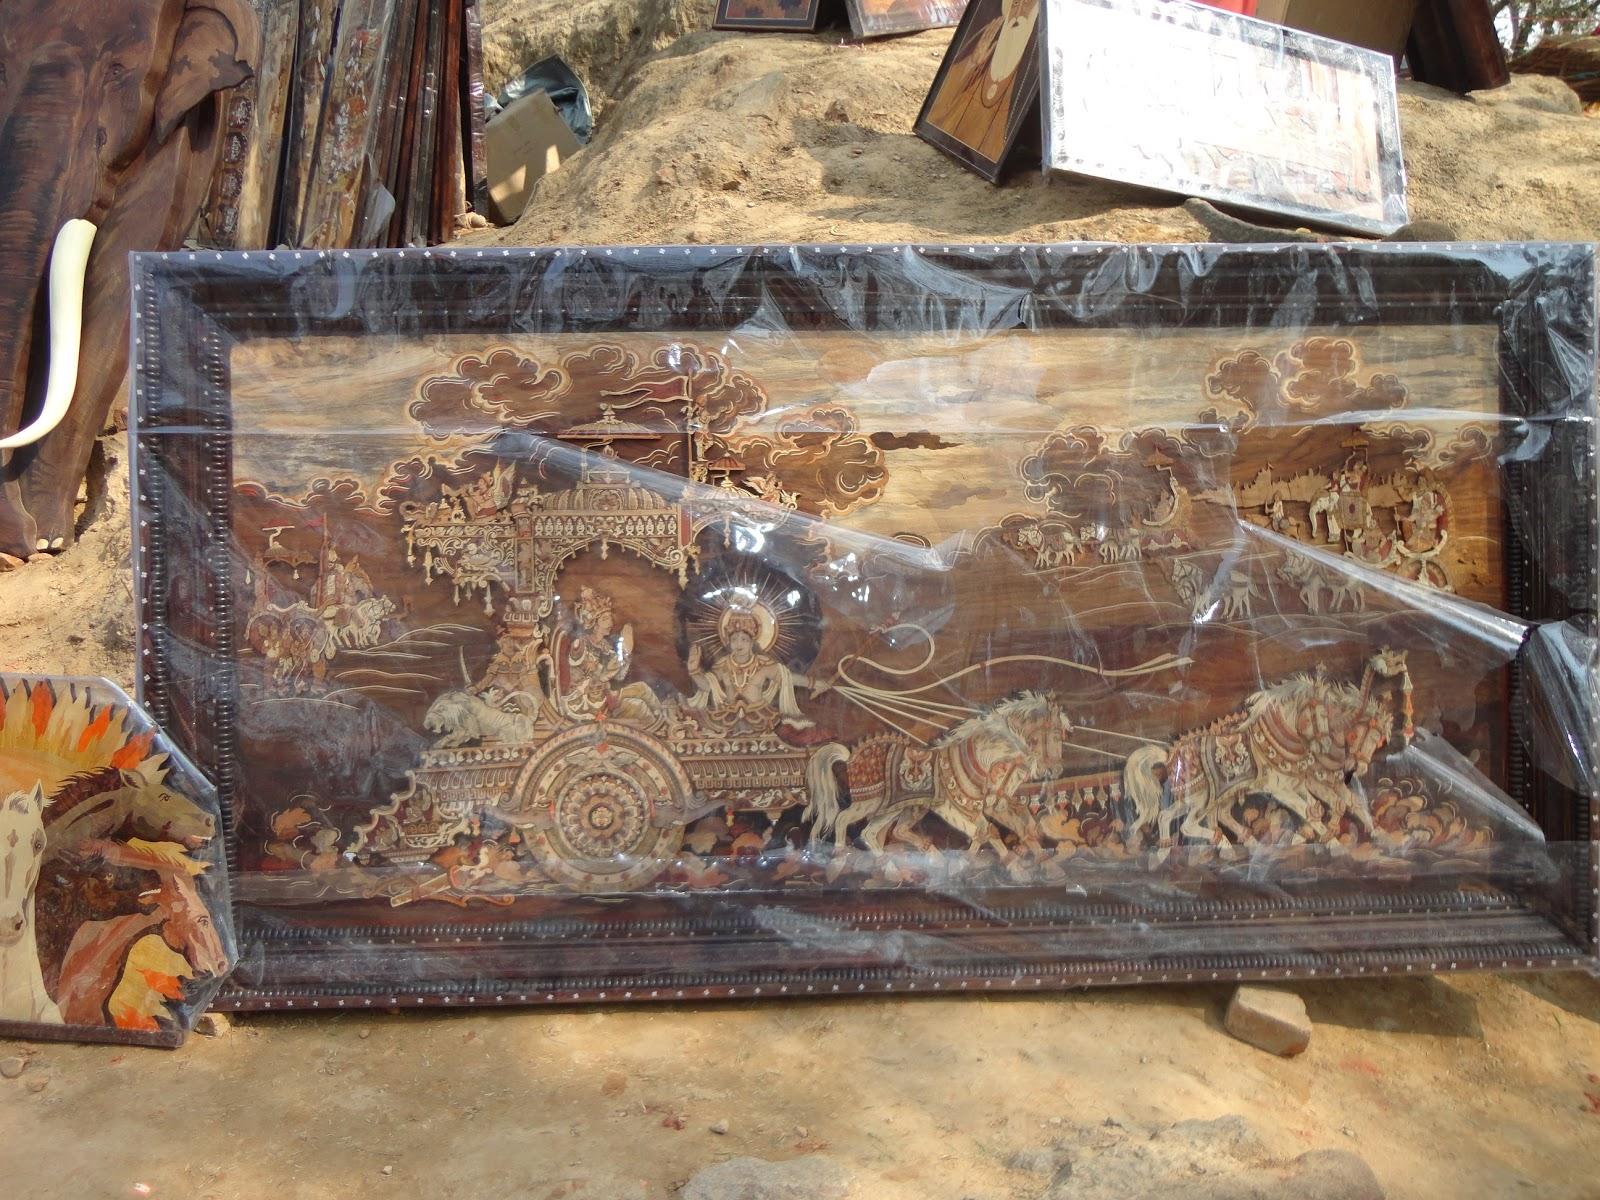 Exquisite Woodwork crafts at Surajkund crafts mela,India